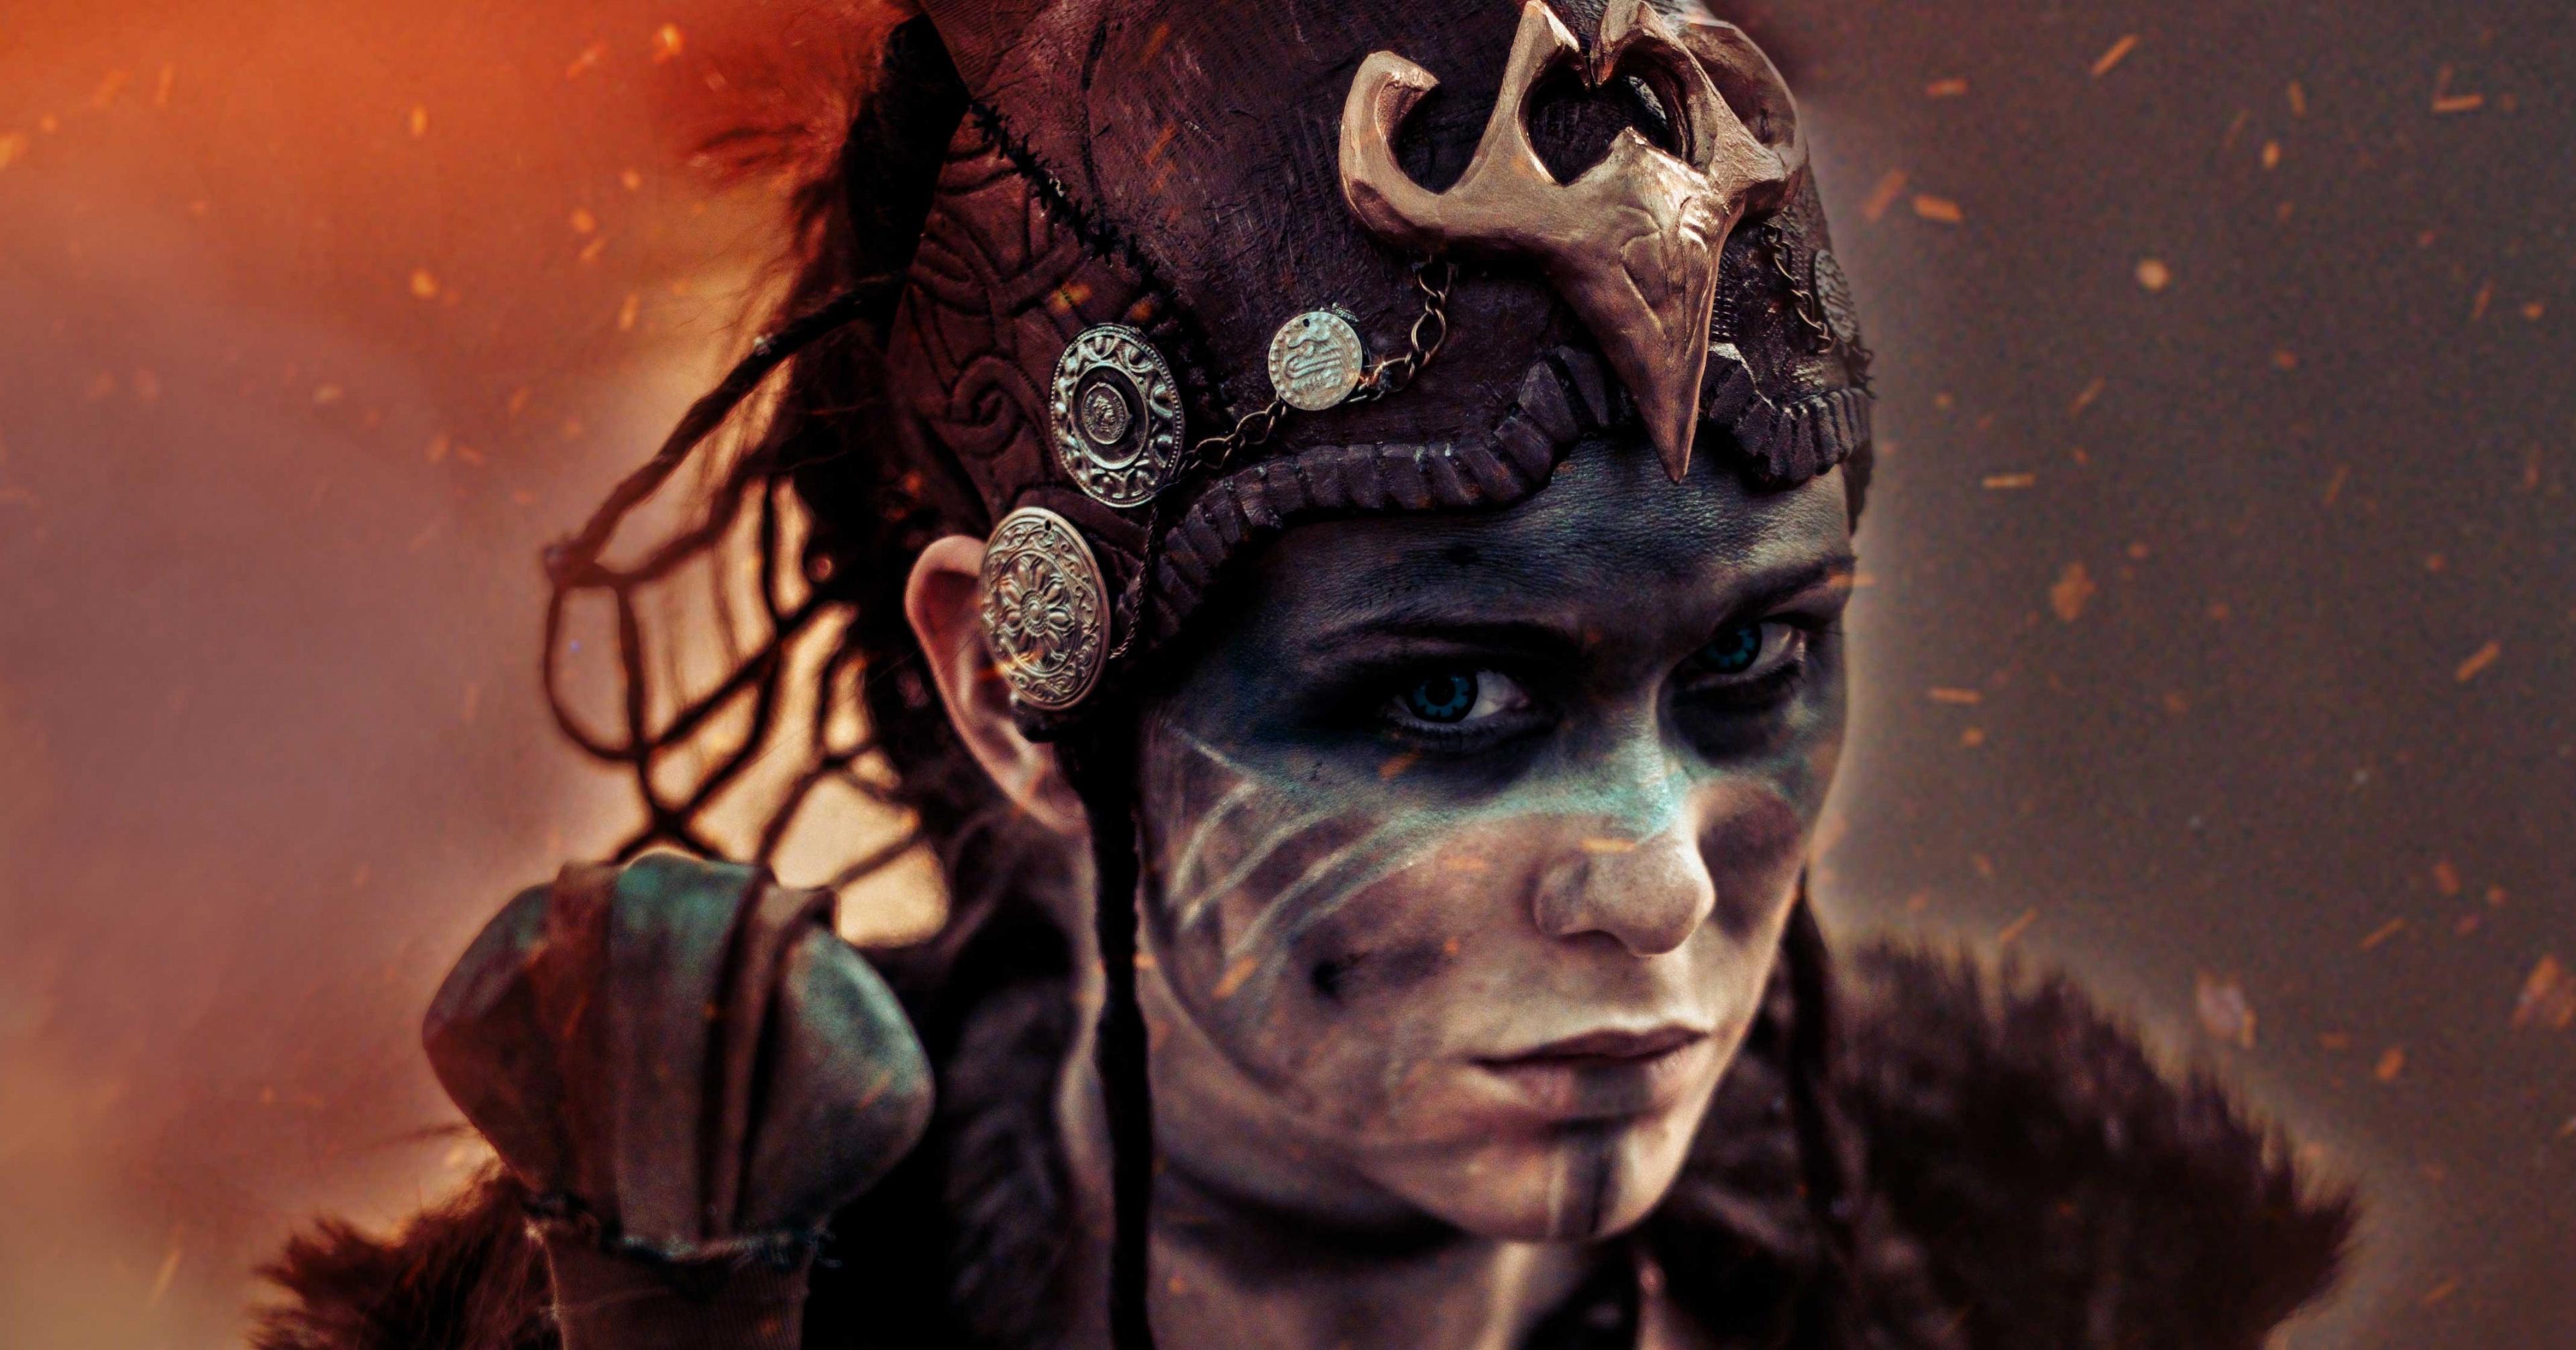 Hellblade: Senua's Sacrifice Backgrounds on Wallpapers Vista